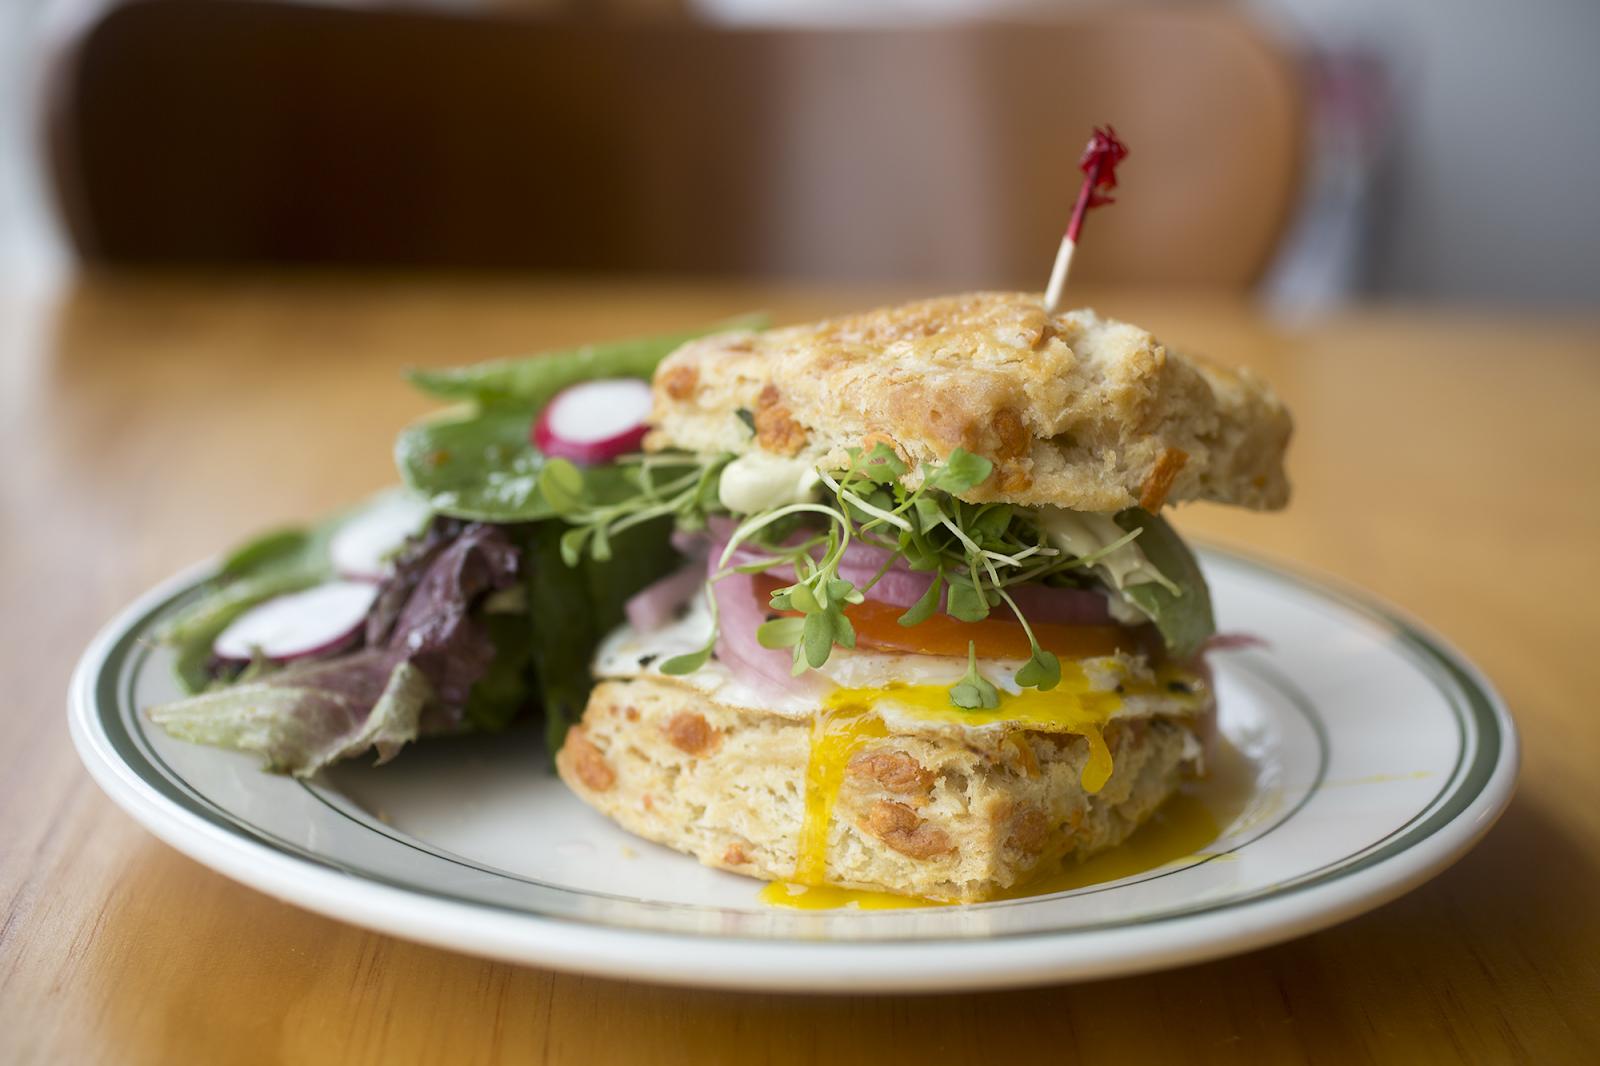 Photo of breakfast sandwich from Dough Mama